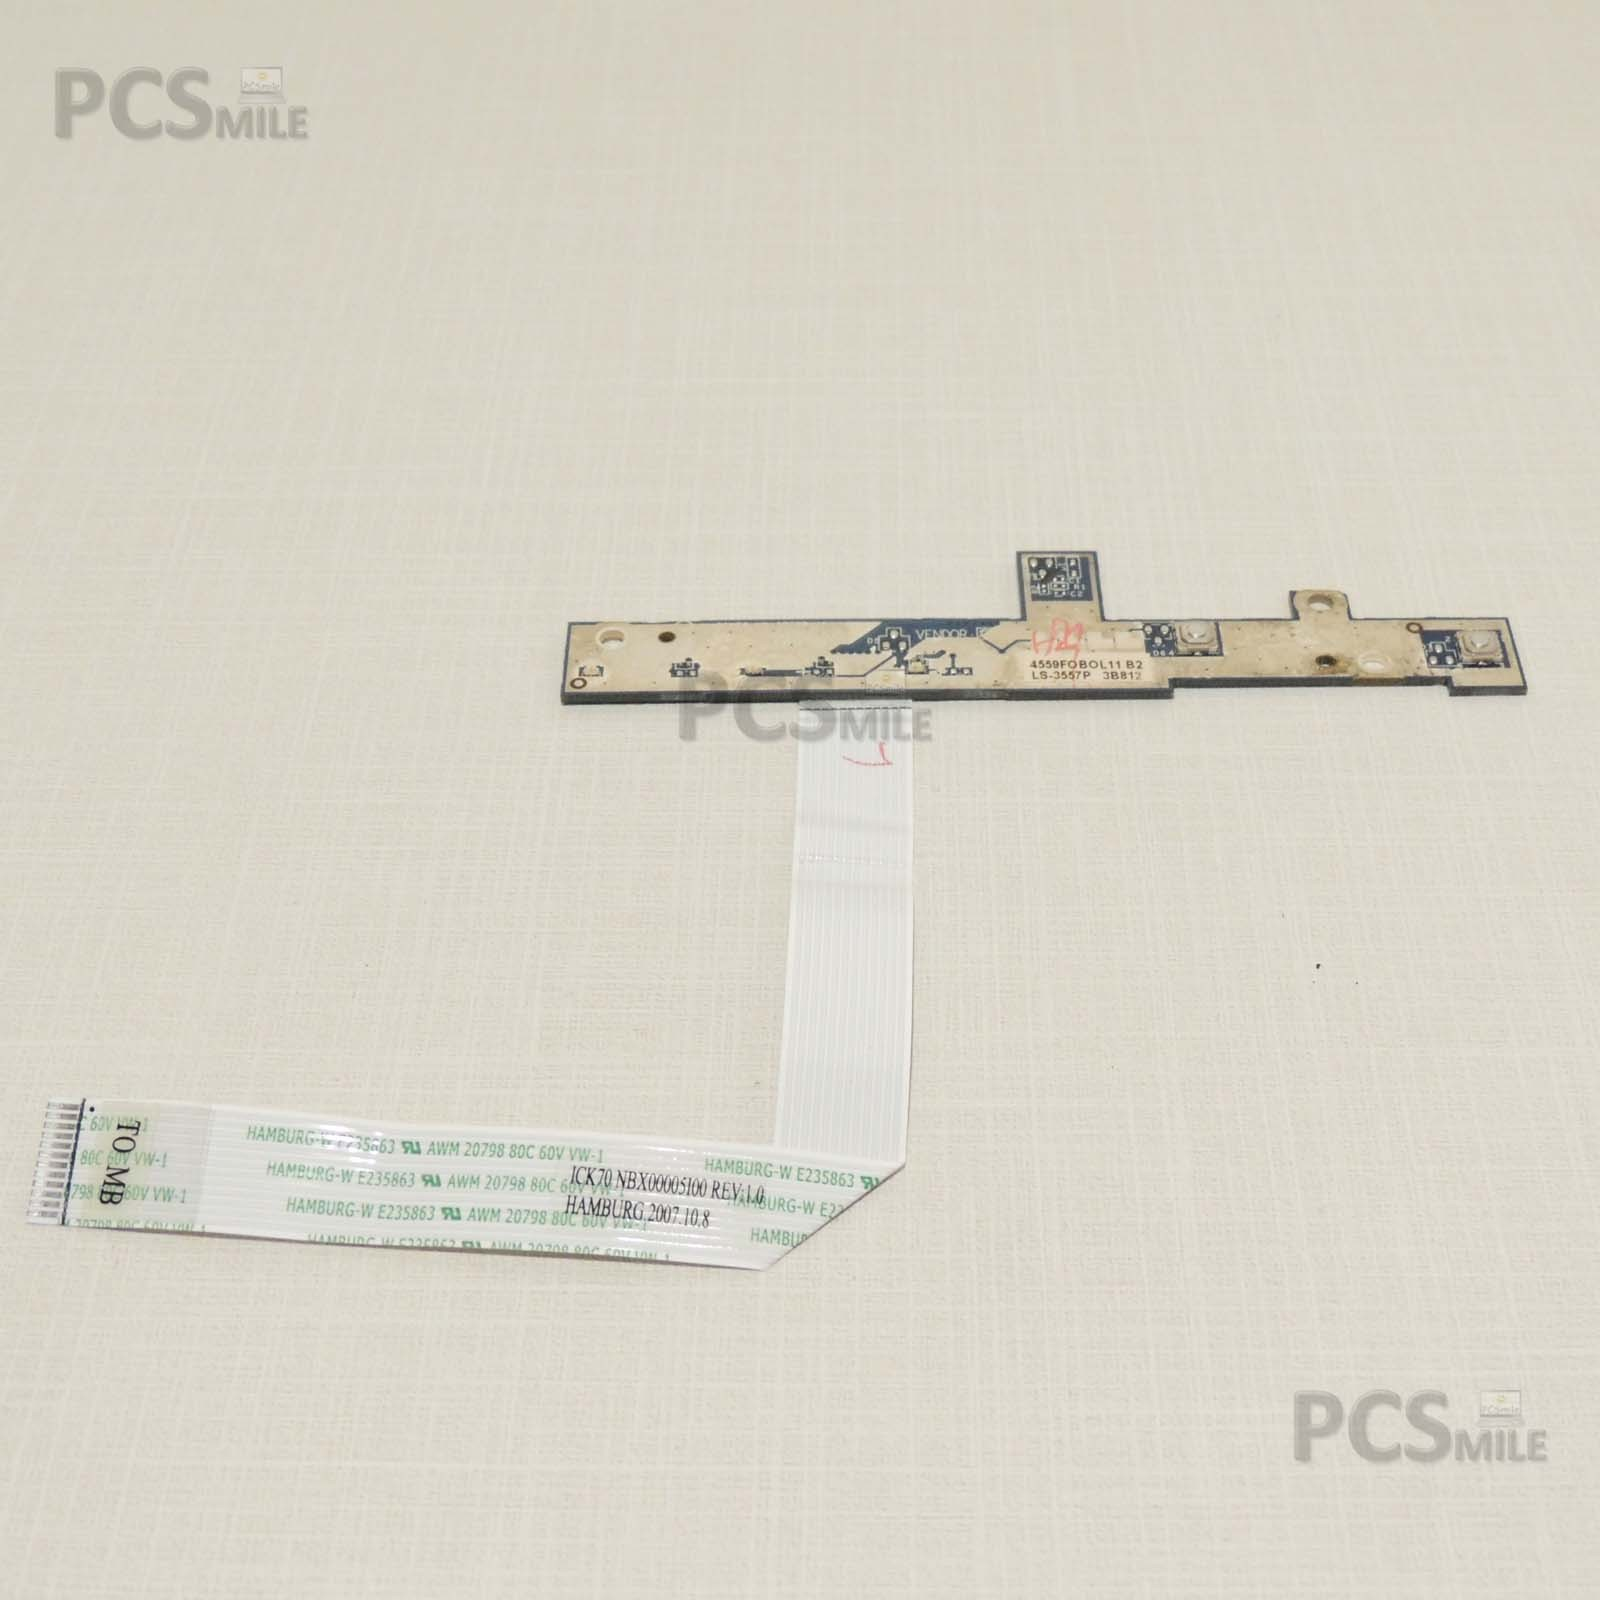 Power button Acer Aspire 7520 Series ICK70 LS-3557P 4559F0B0L11 tasto accensione